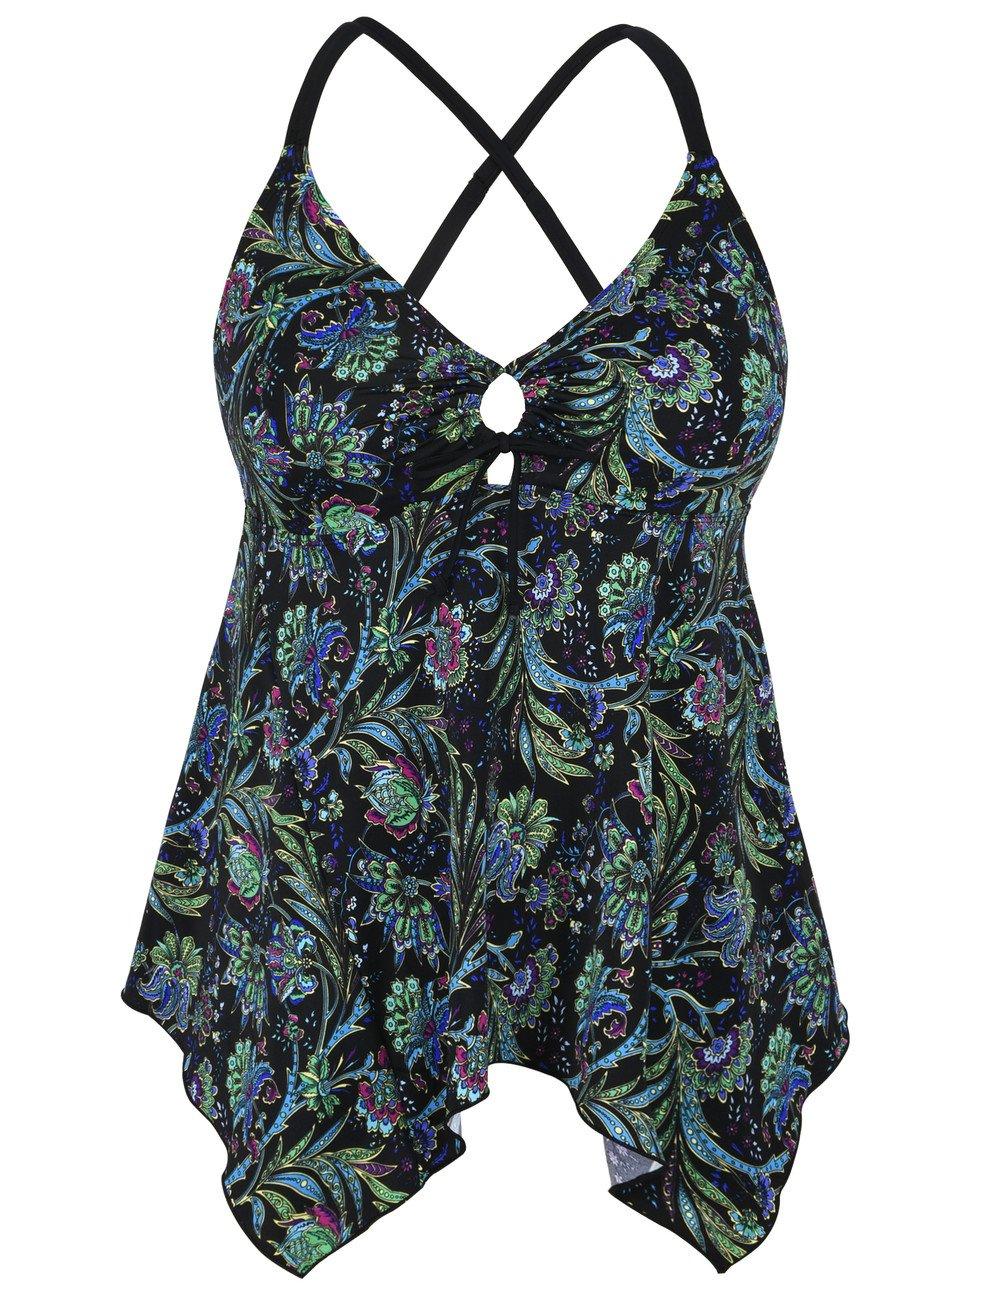 Hilor SWIMWEAR レディース B0793HL79R 12|Black&green Floral